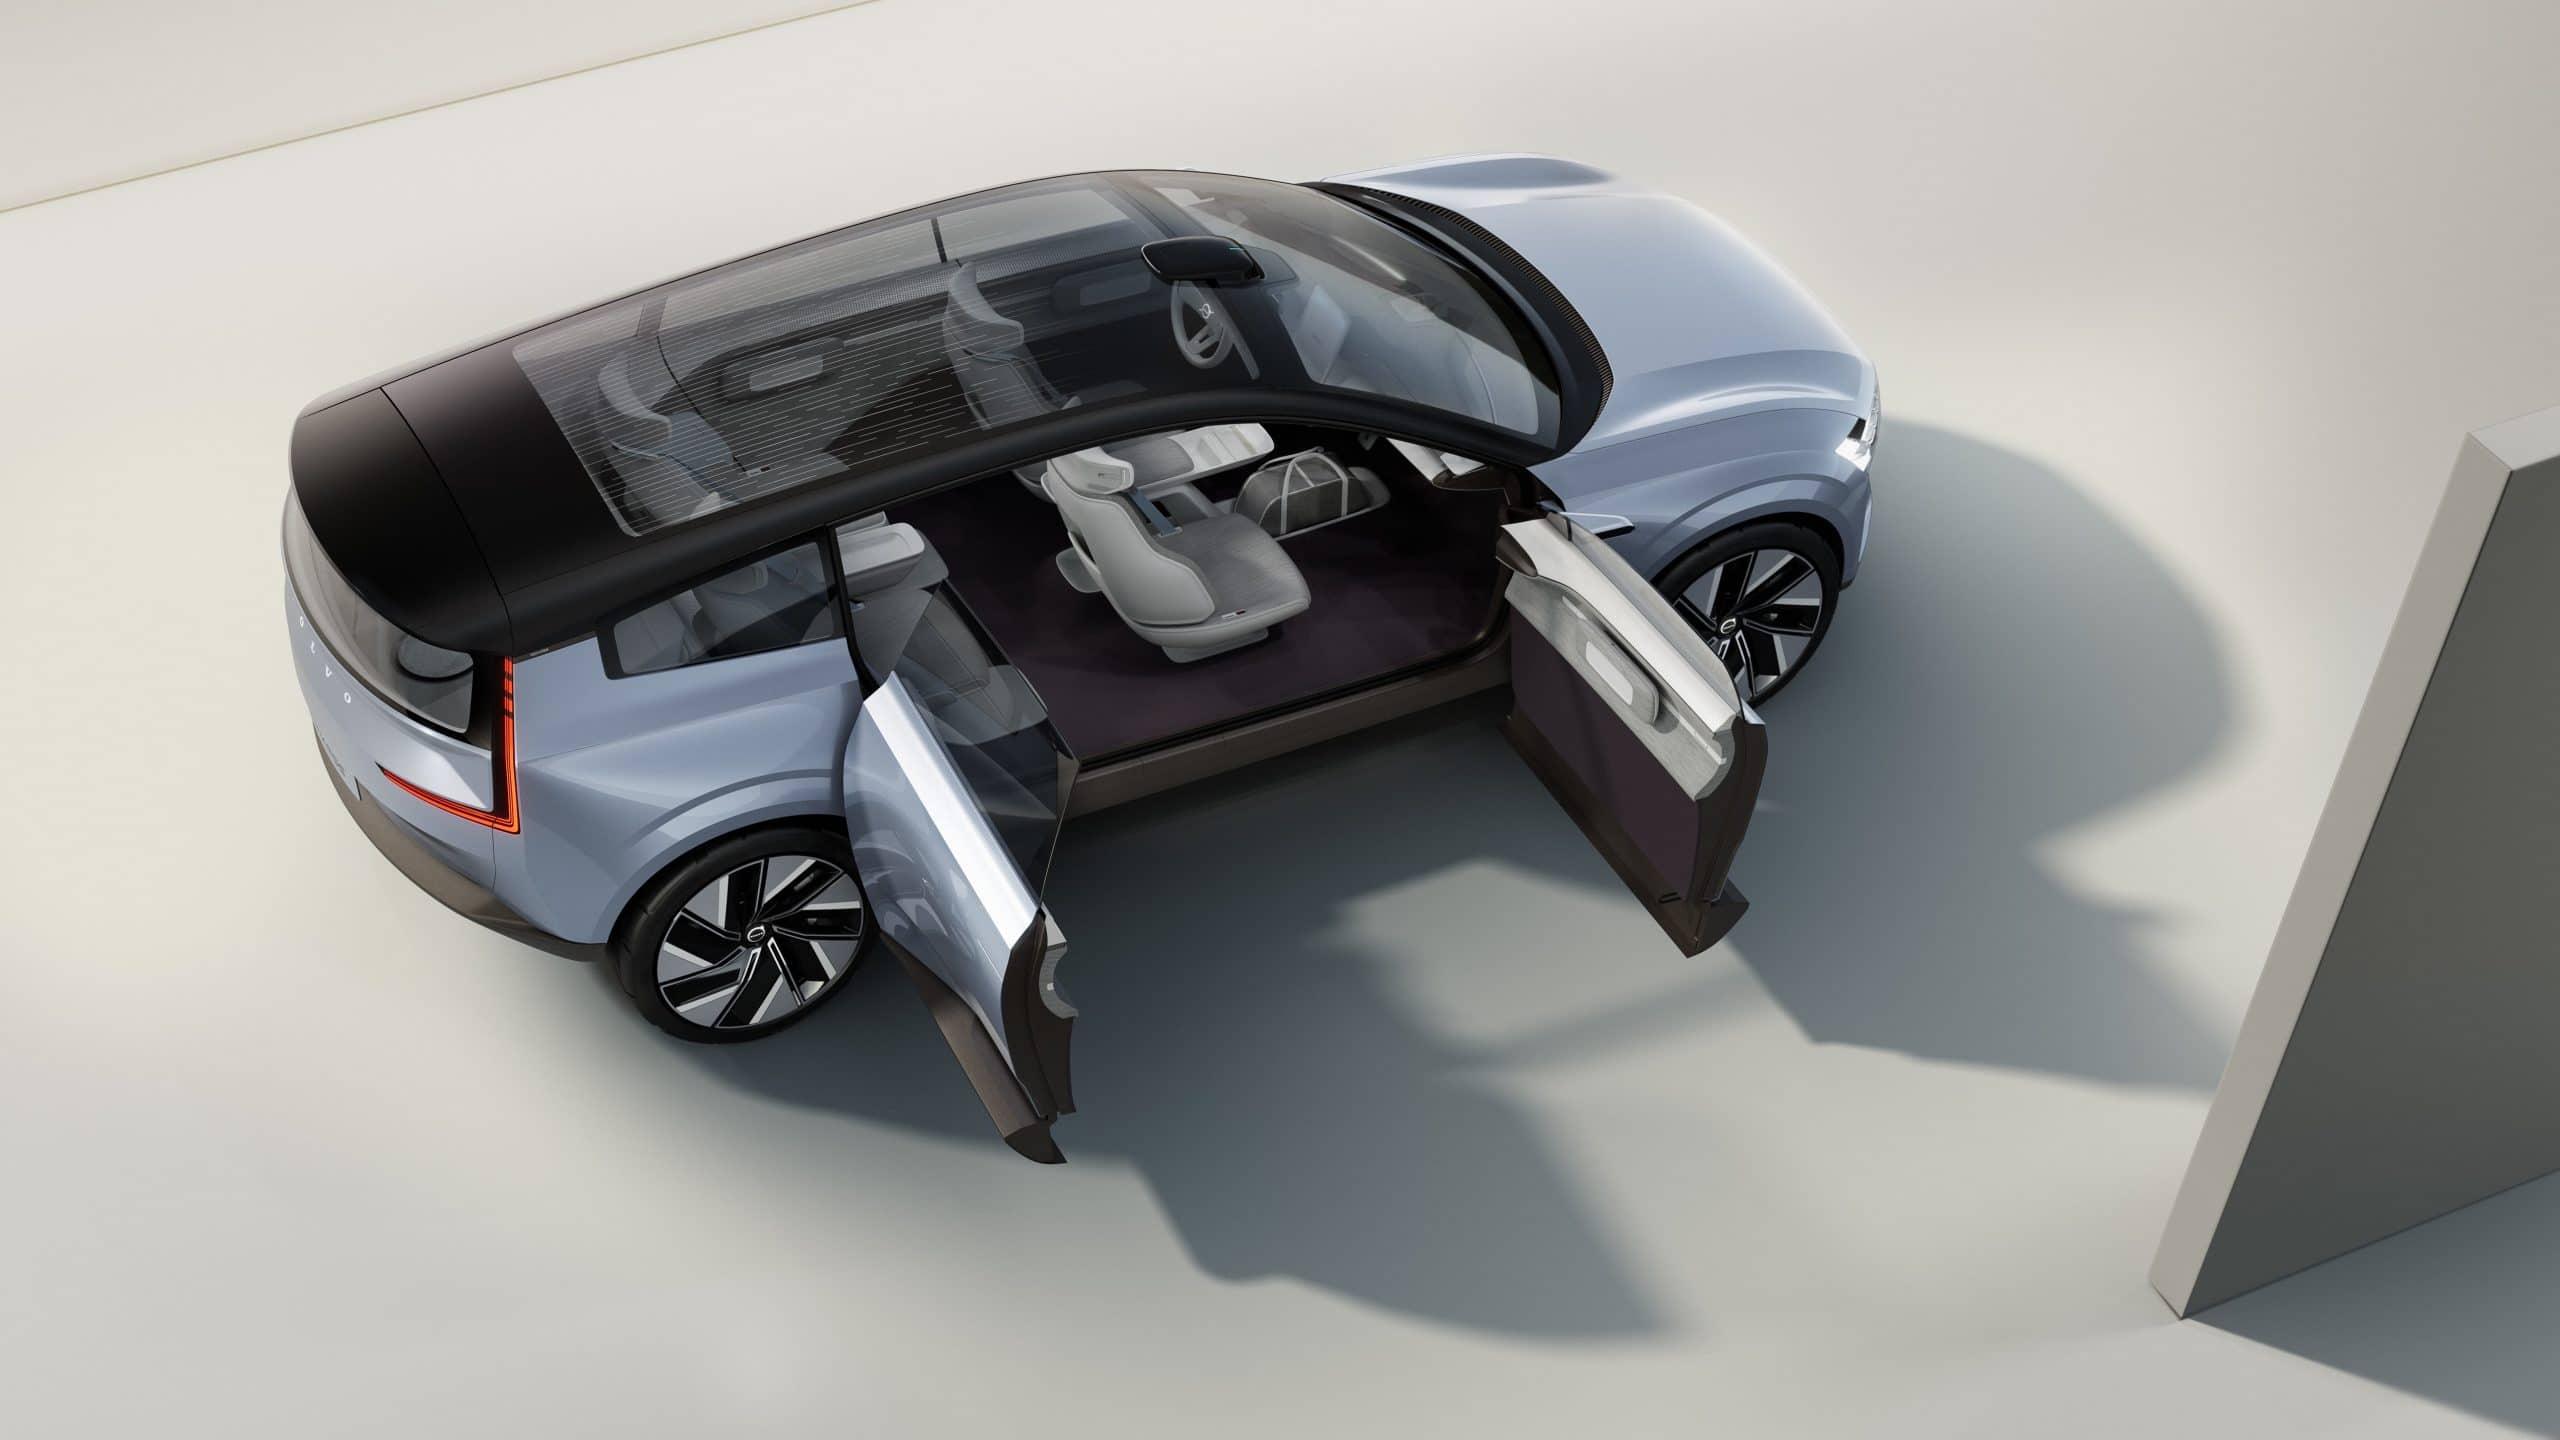 283695 Volvo Concept Recharge scaled Η Volvo μας δείχνει το μέλλον της με το Concept Recharge Concept Recharge, Volvo, Volvo Cars, Volvo Concept Recharge, zblog, ειδήσεις, Νέα